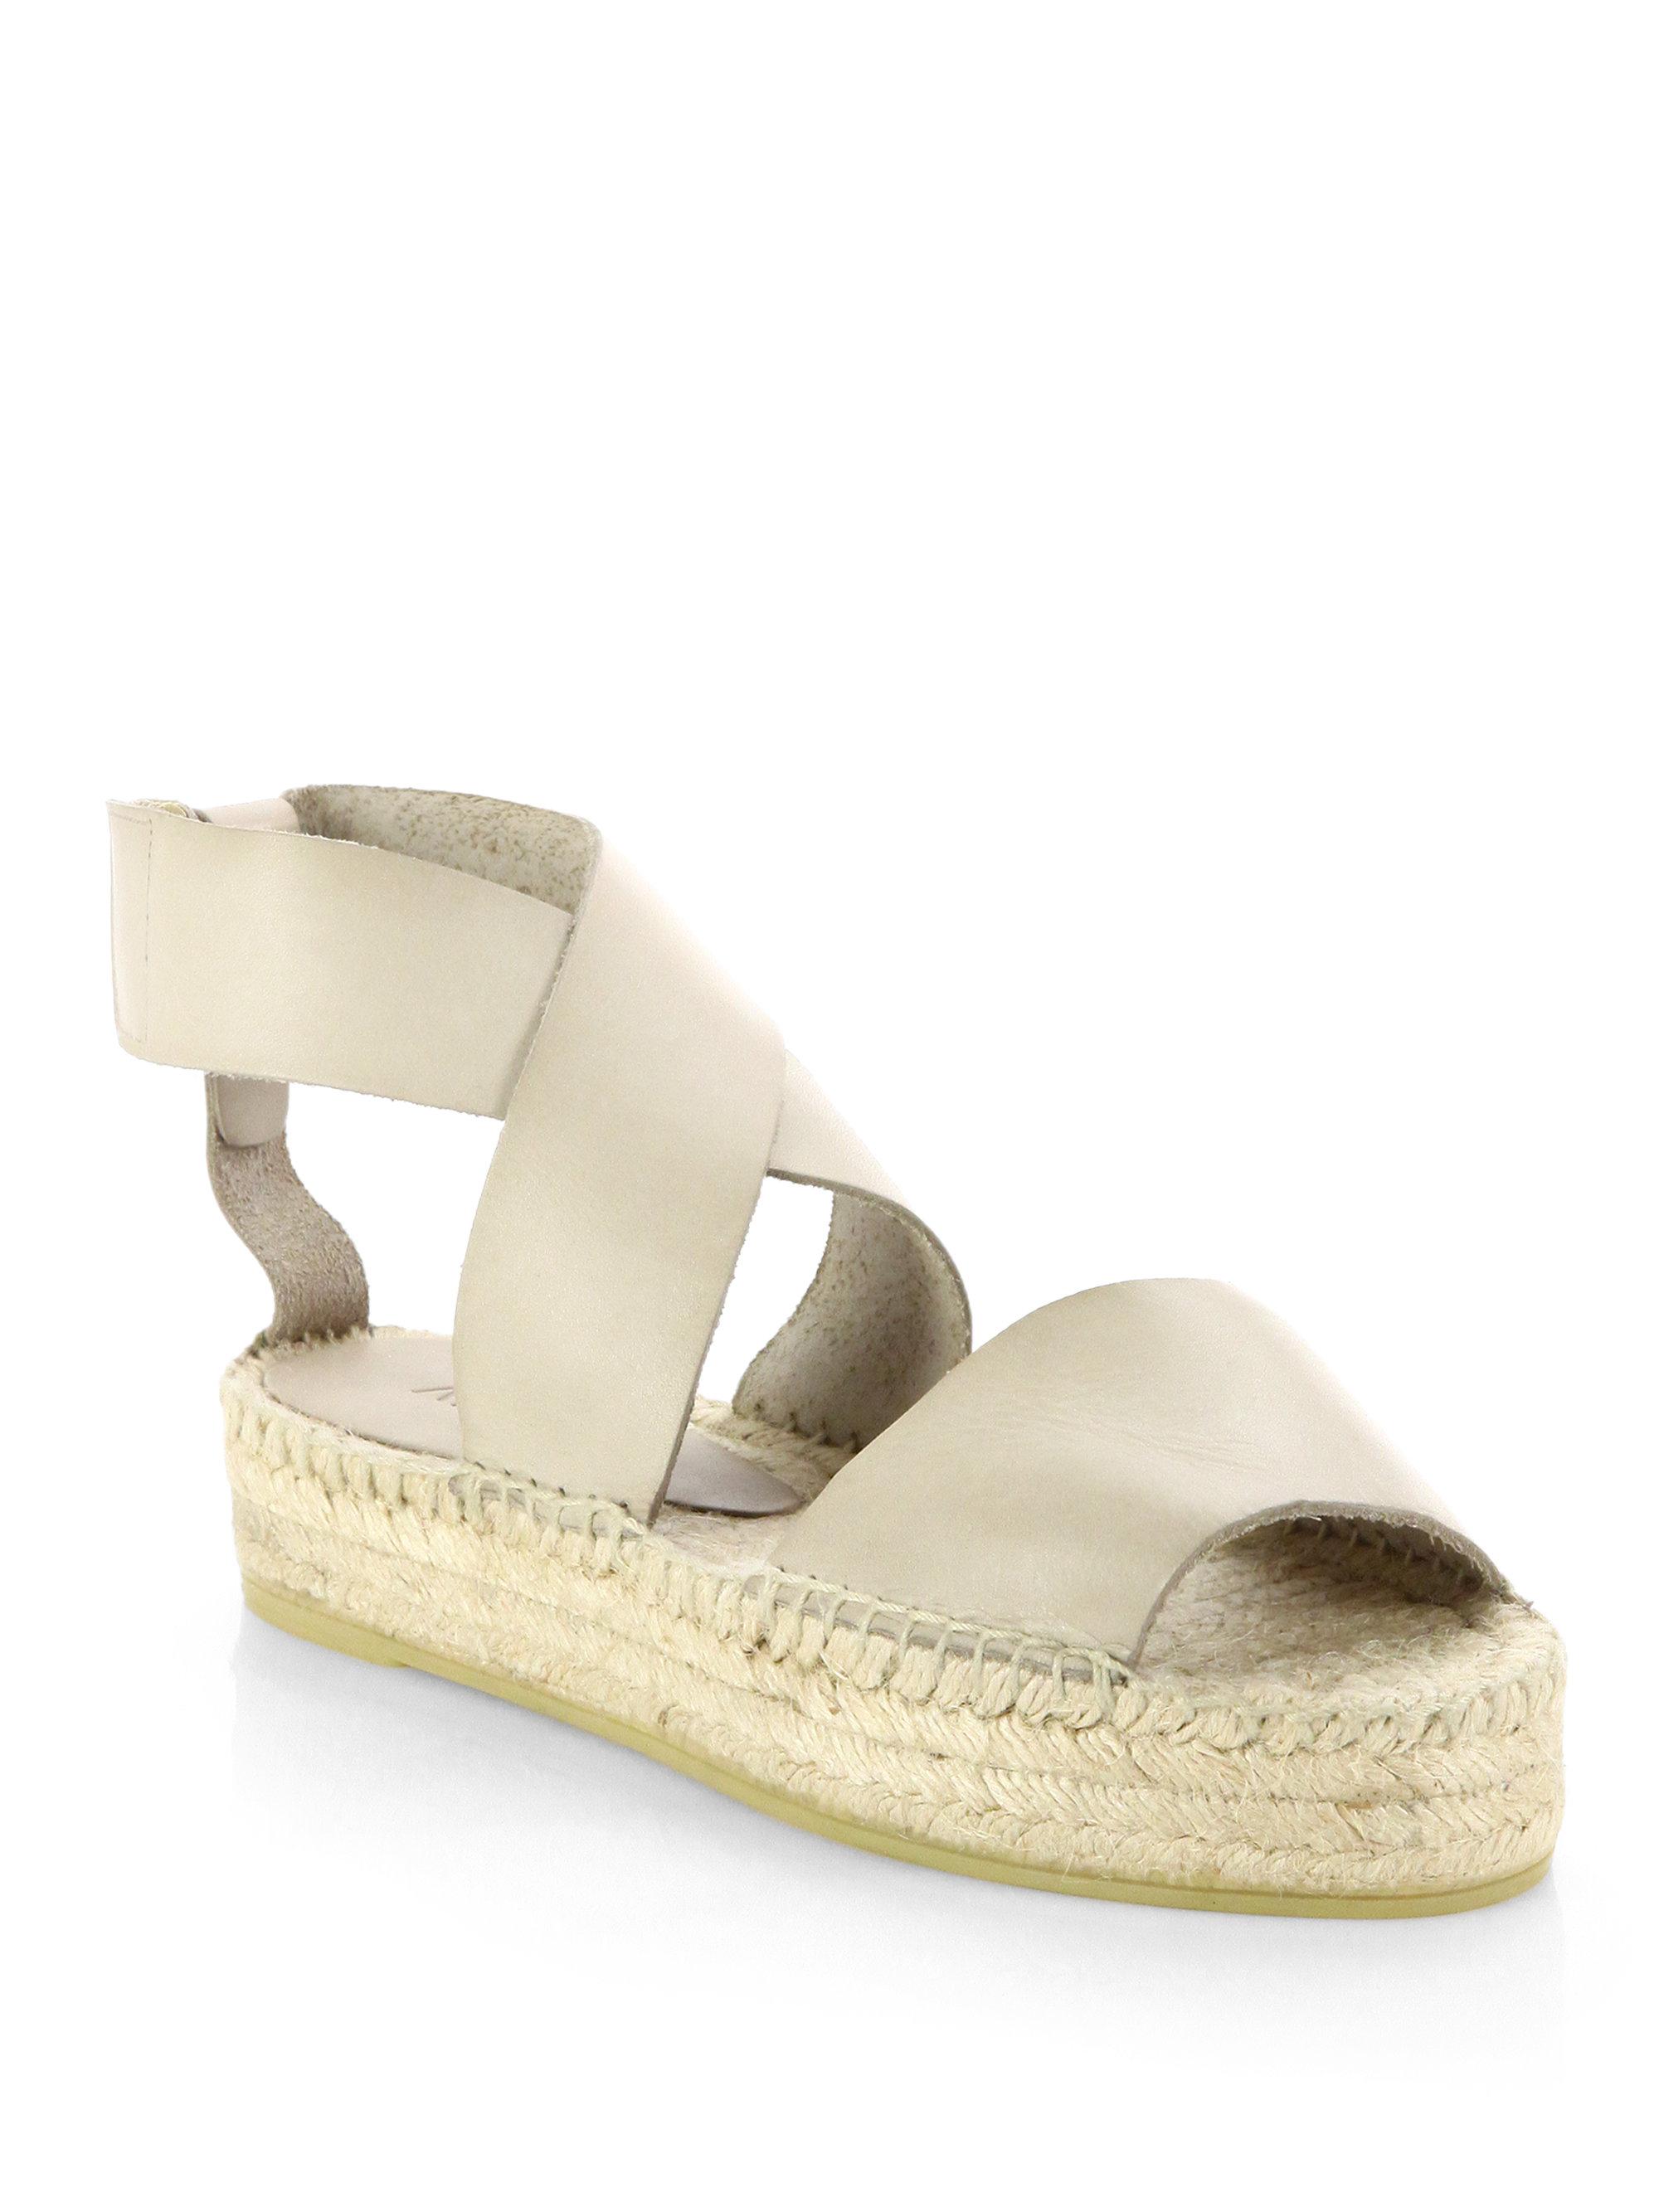 Vince Elise Leather Espadrille Sandals In Natural Lyst